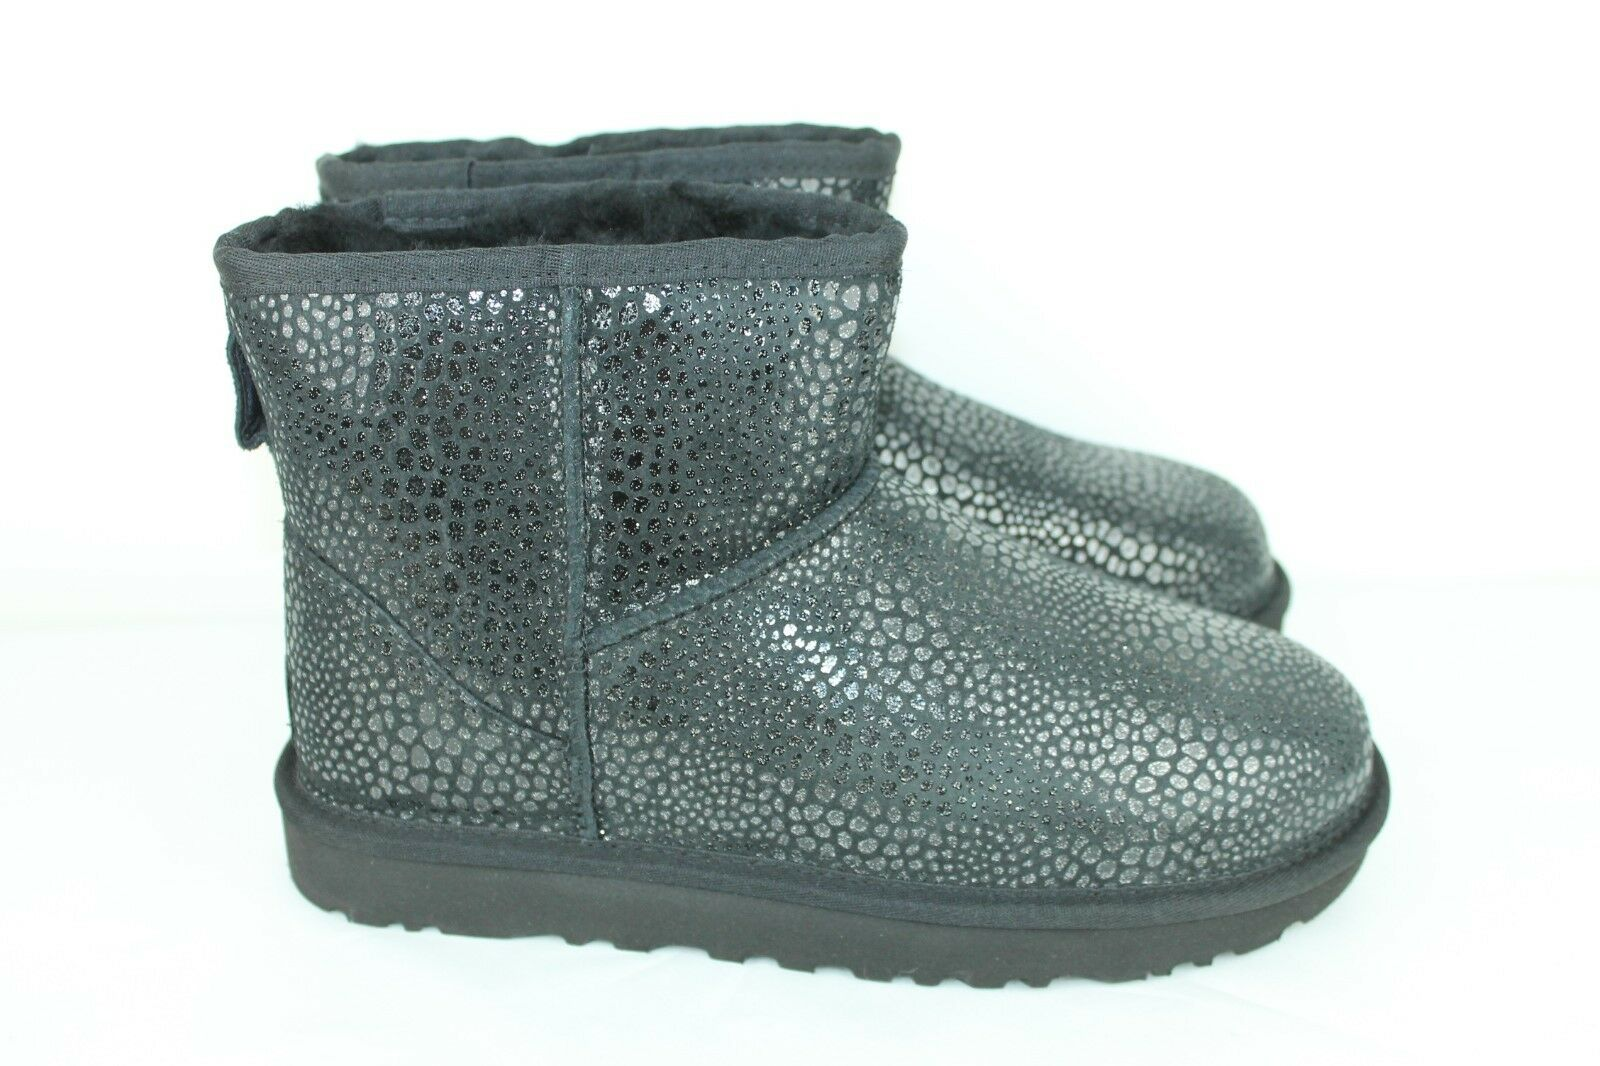 00e69eeb2f1 UGG Australia Womens Classic Mini Glitzy Ankle BOOTS Black Leather Size 8